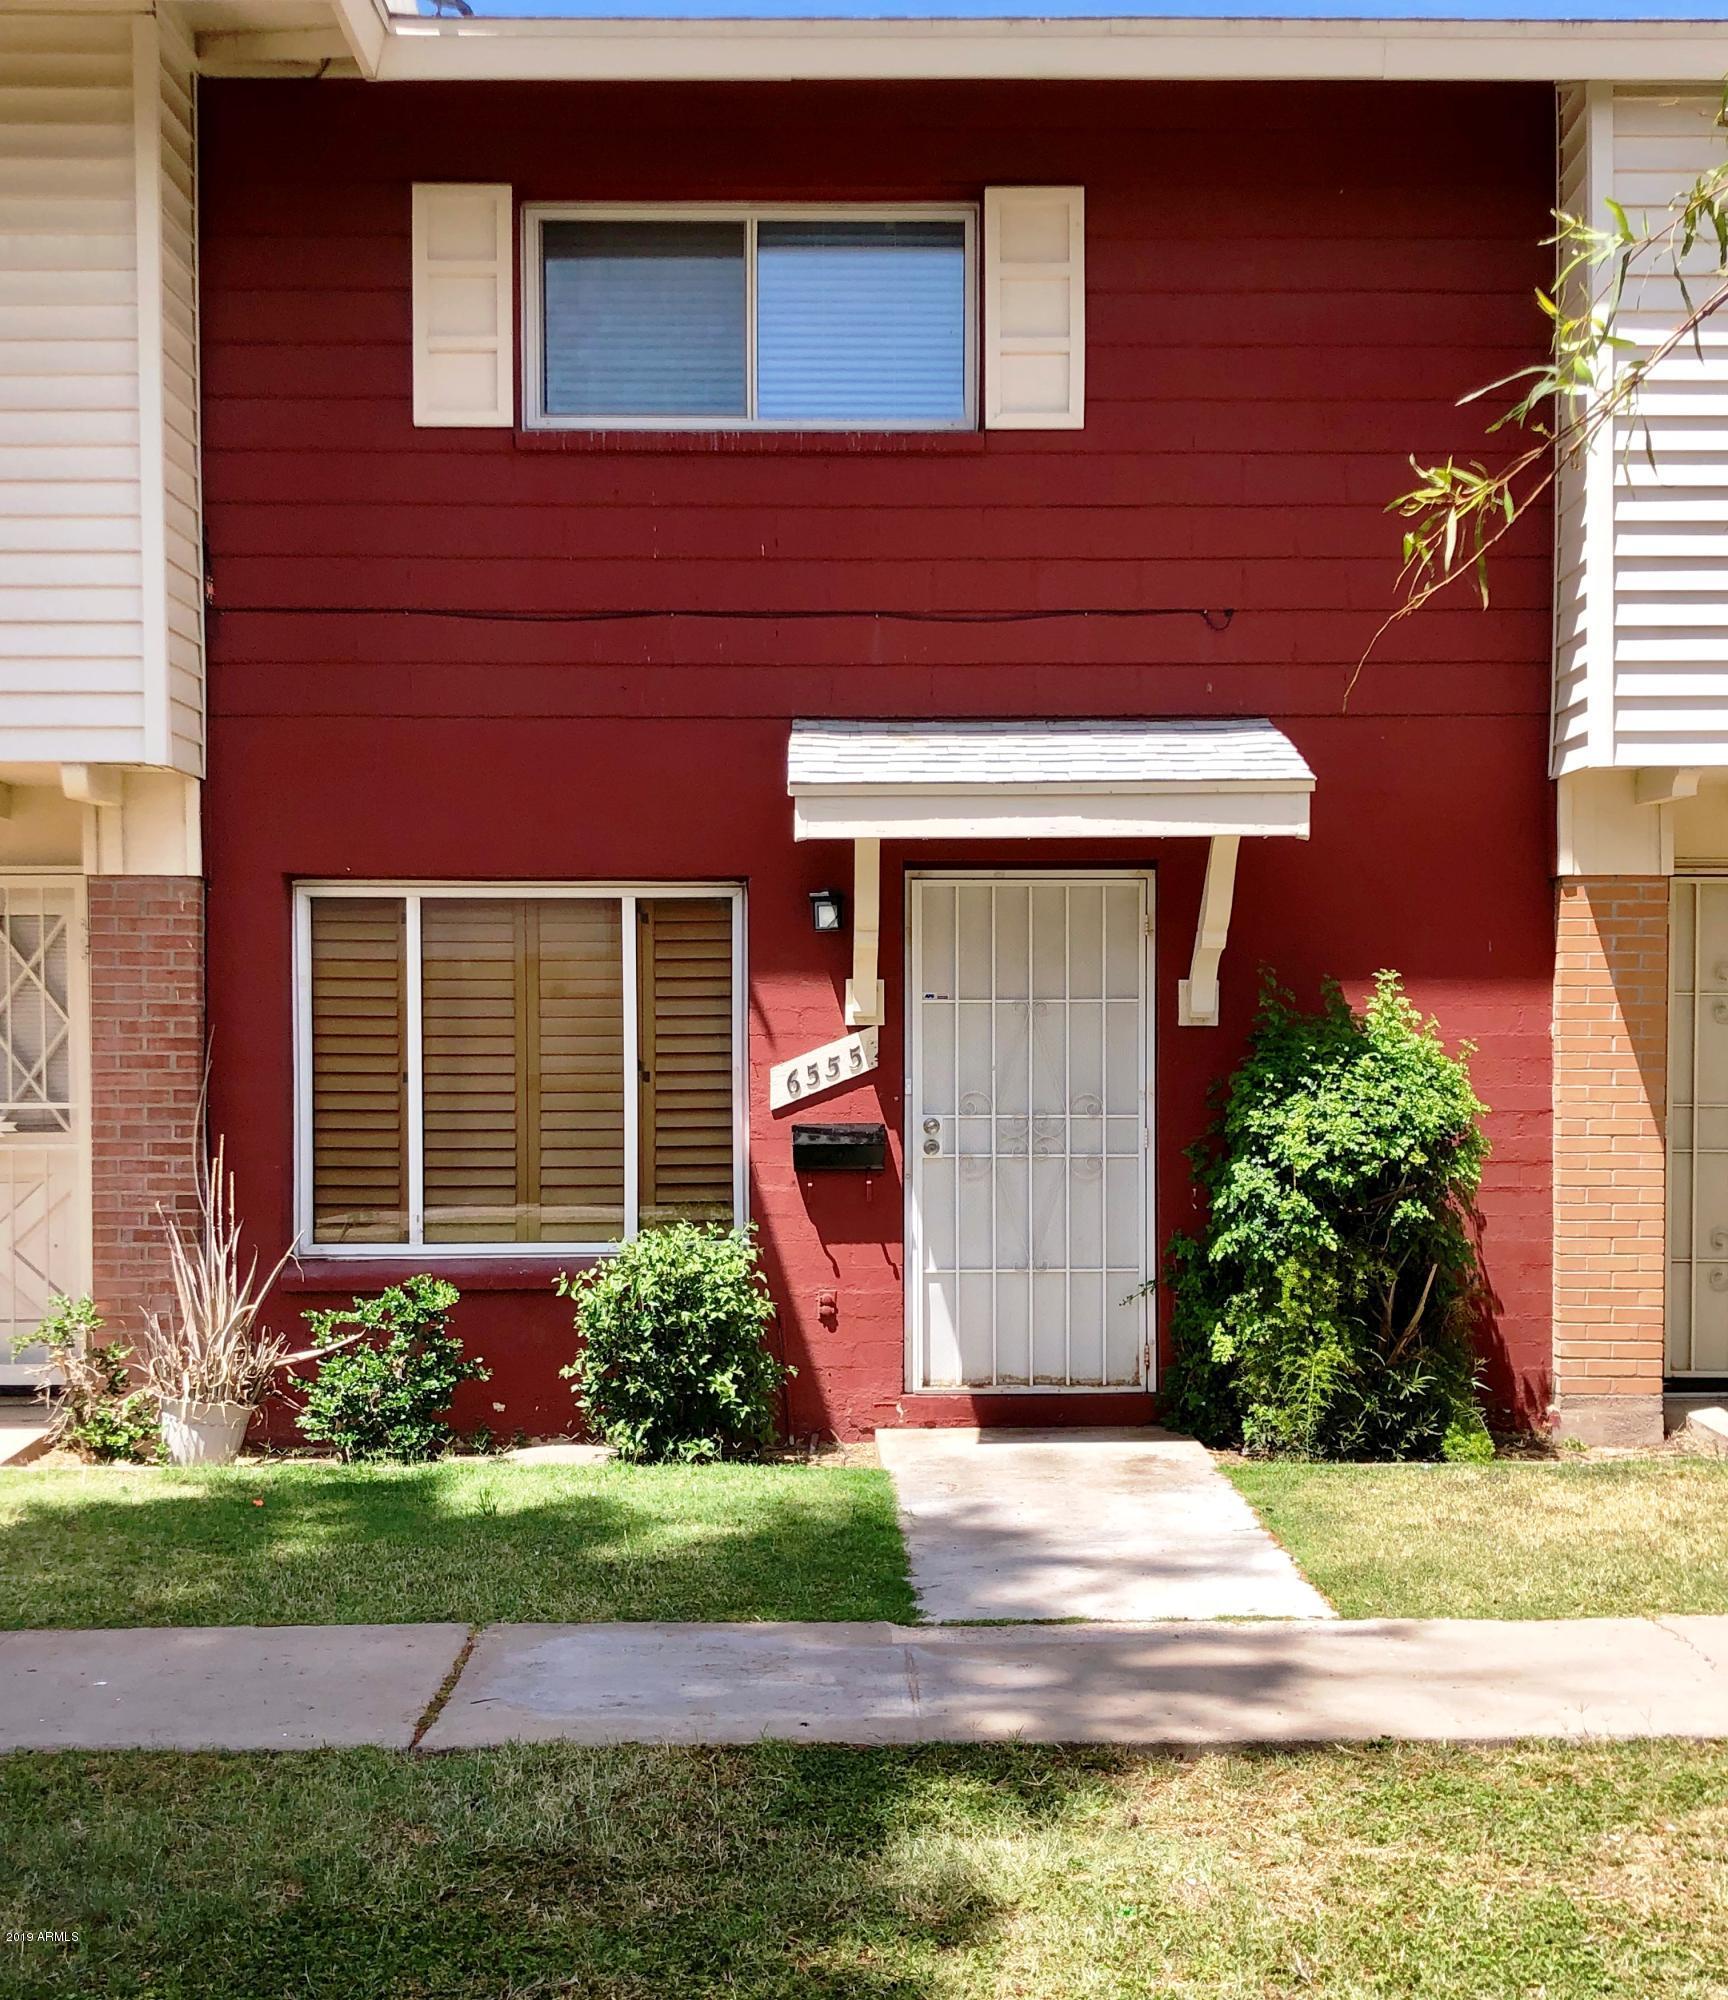 Photo of 6555 N 44TH Avenue, Glendale, AZ 85301